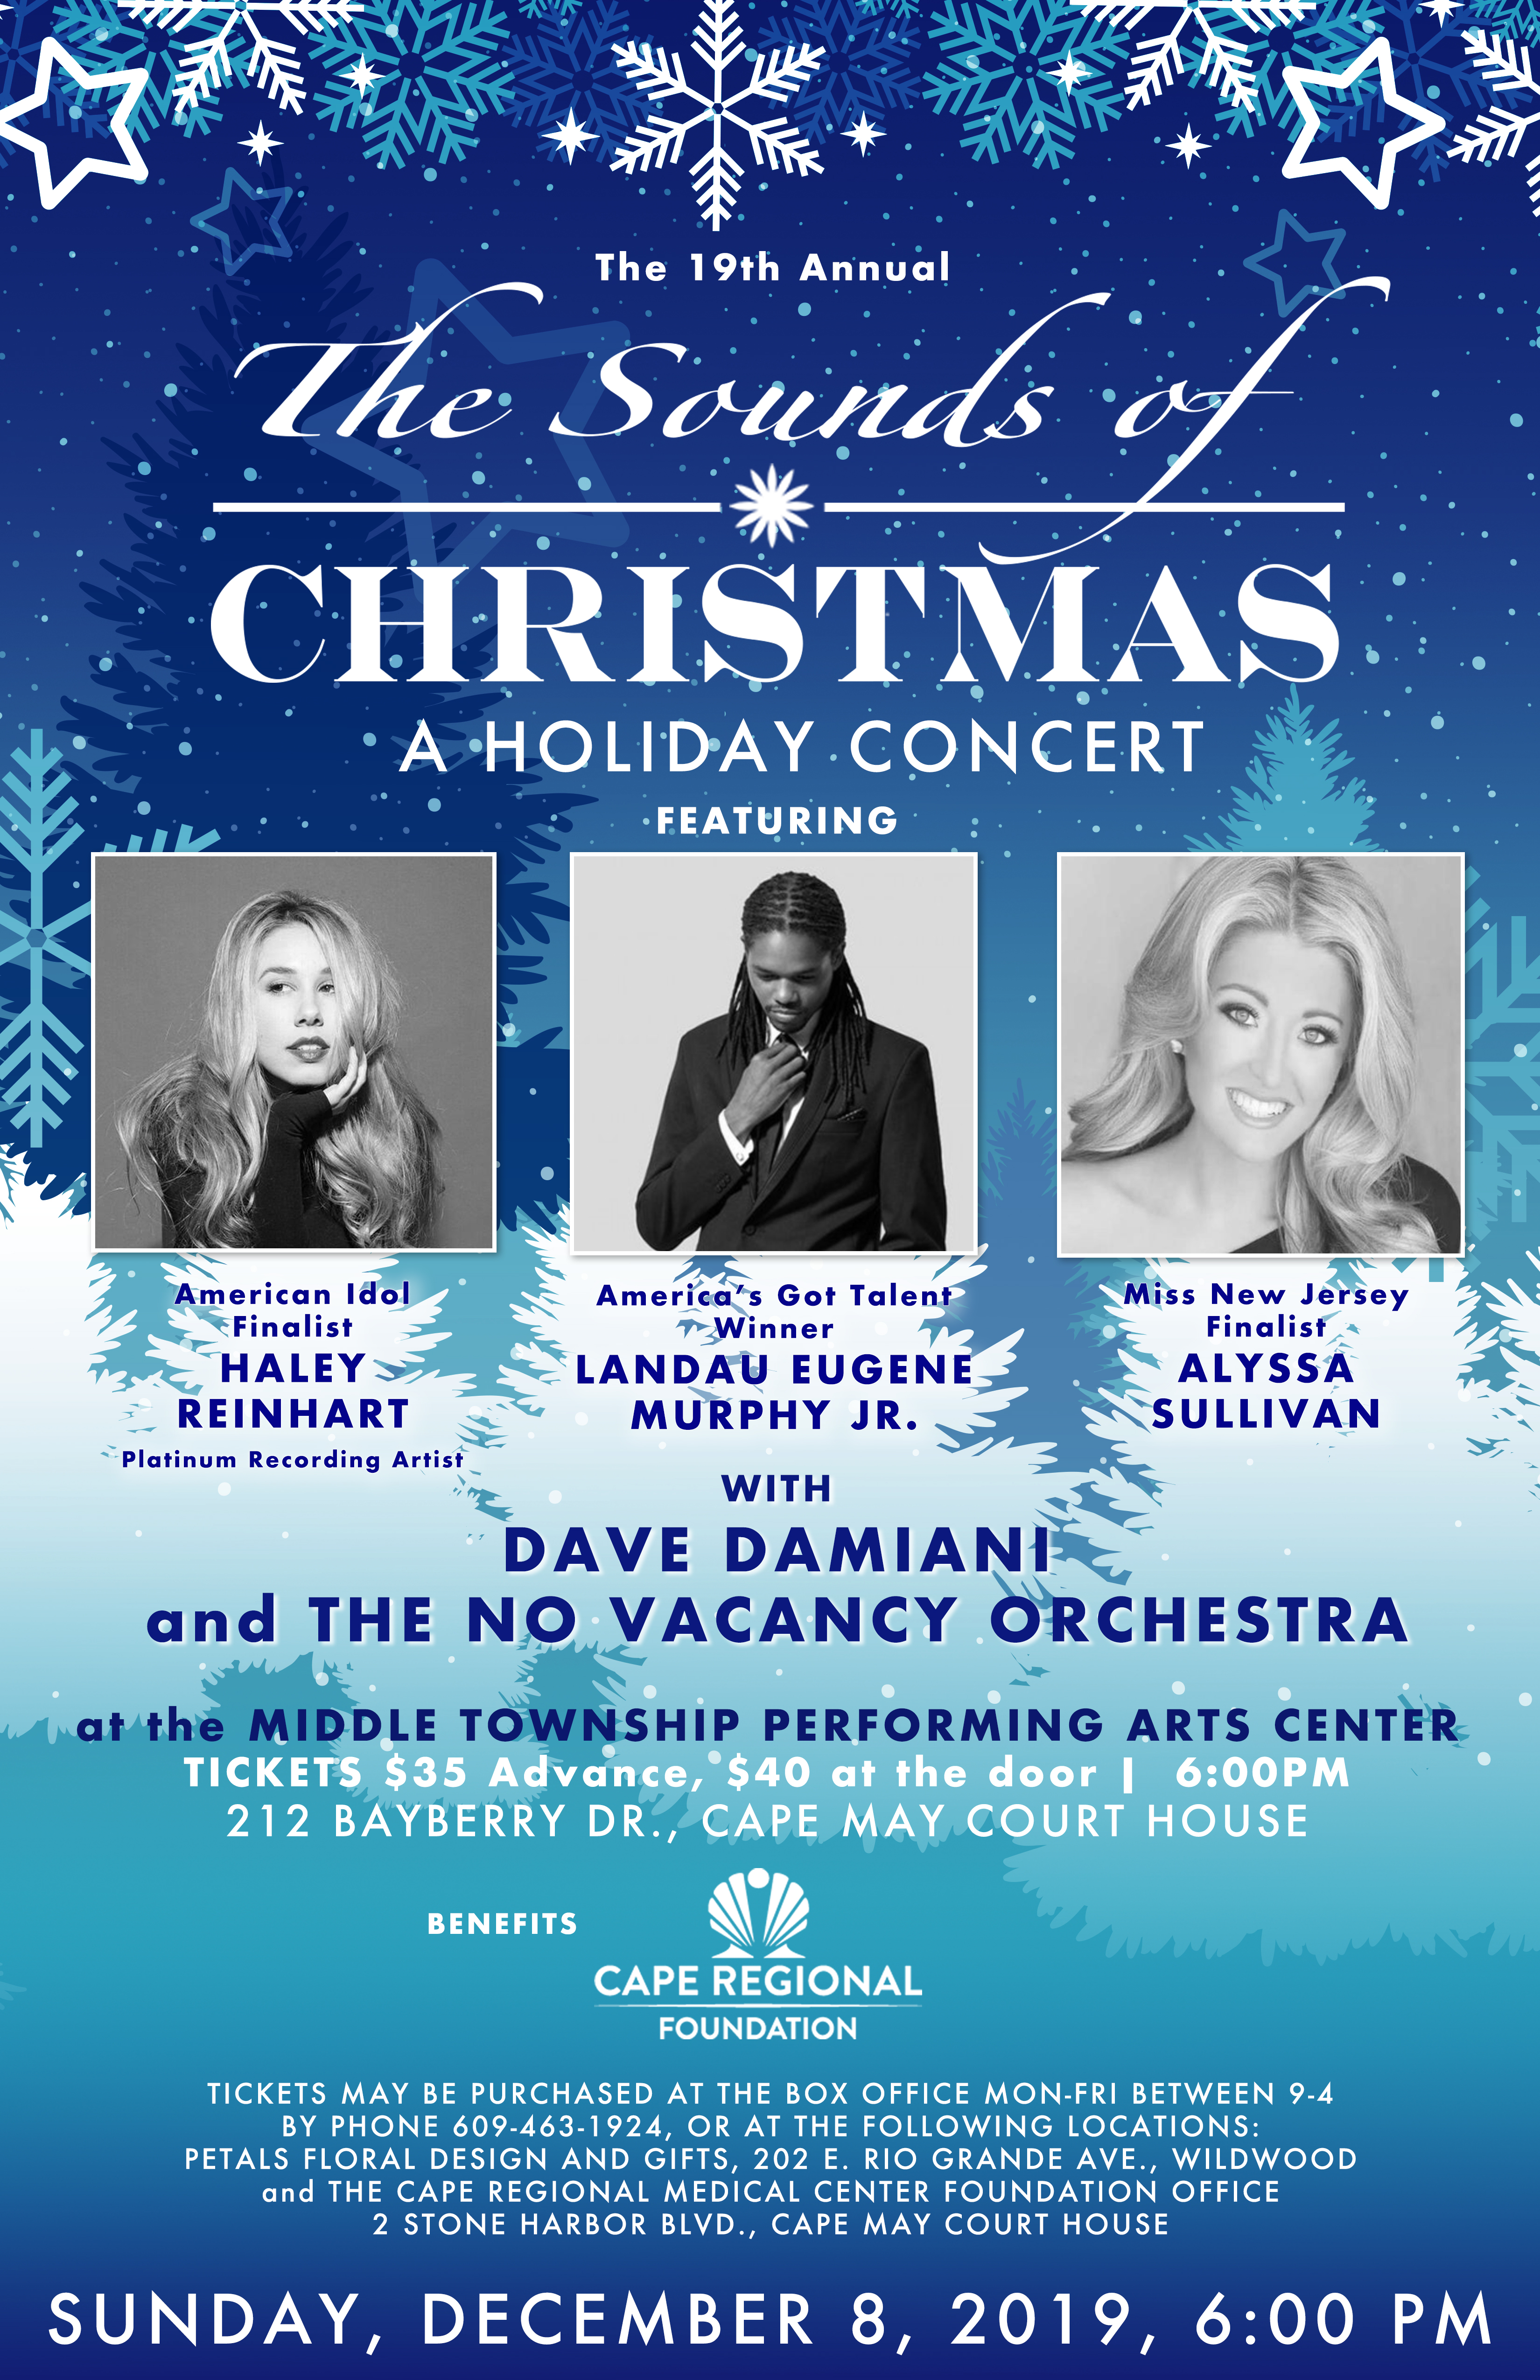 Sounds Of Christmas w/ Haley Reinhart, Landau Murphy Jr, Alyssa Sullivan & Dave Damiani